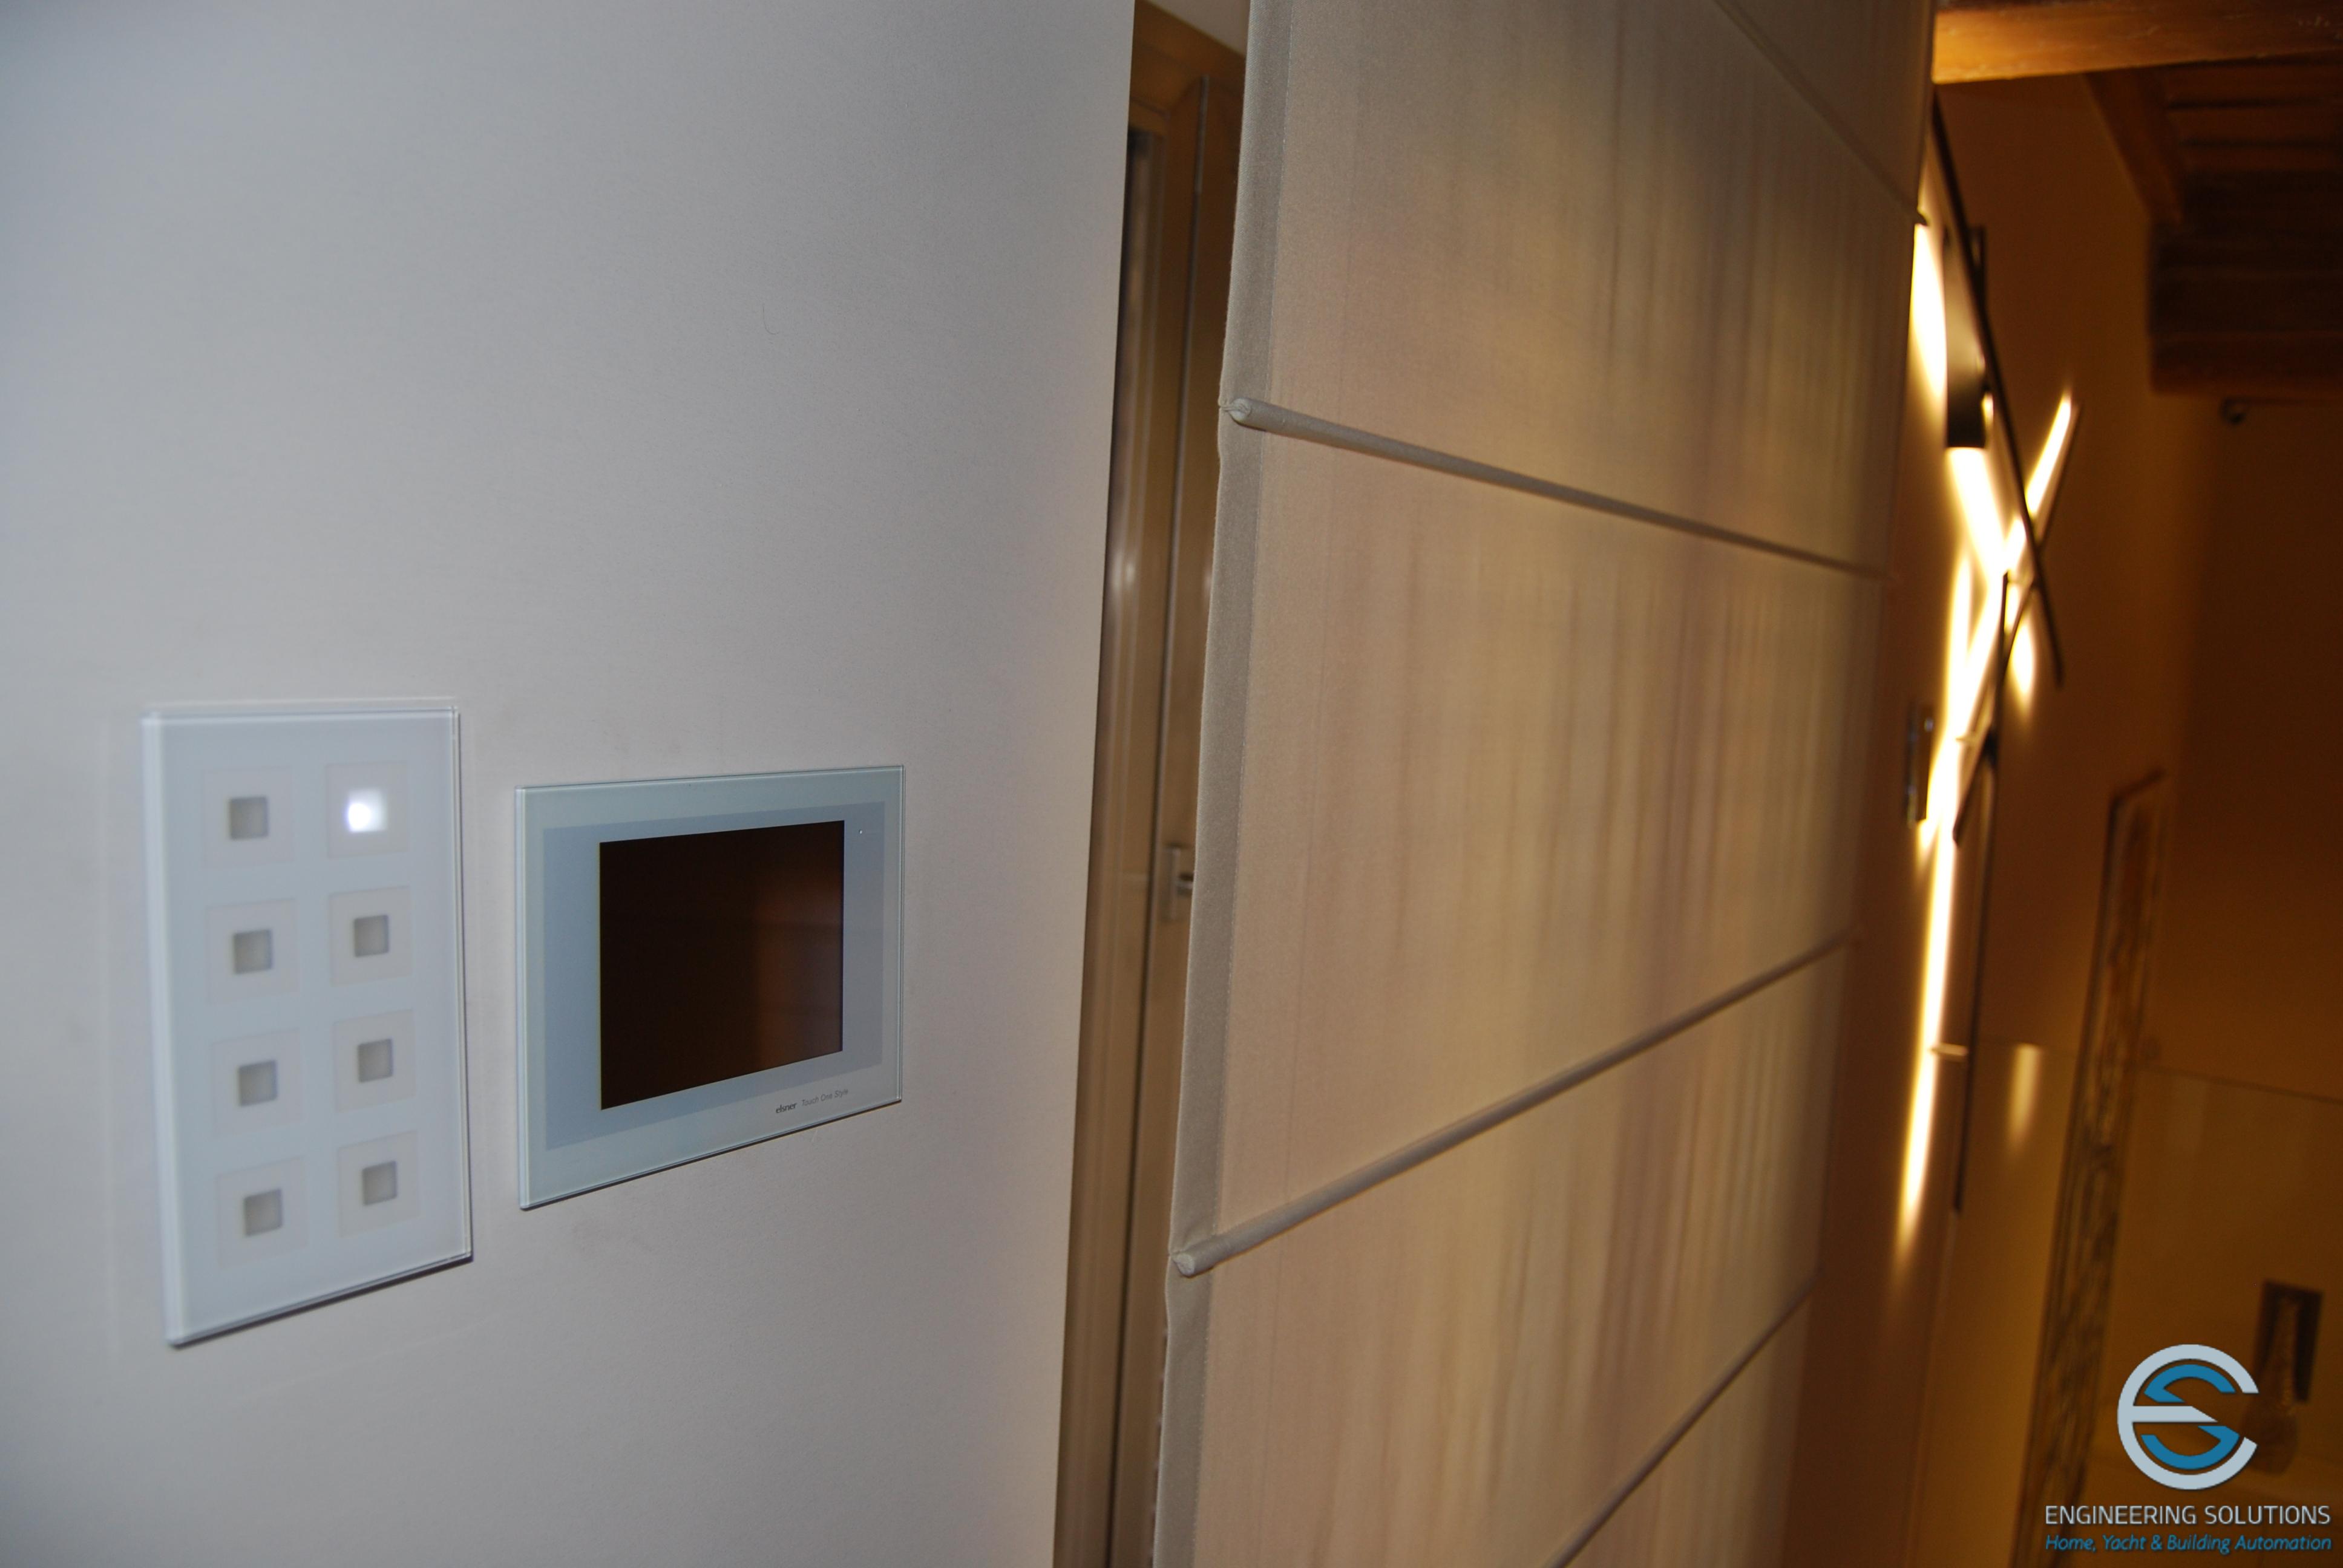 Engineering Solutions - Residenza privata Quartiere Ponte, Roma